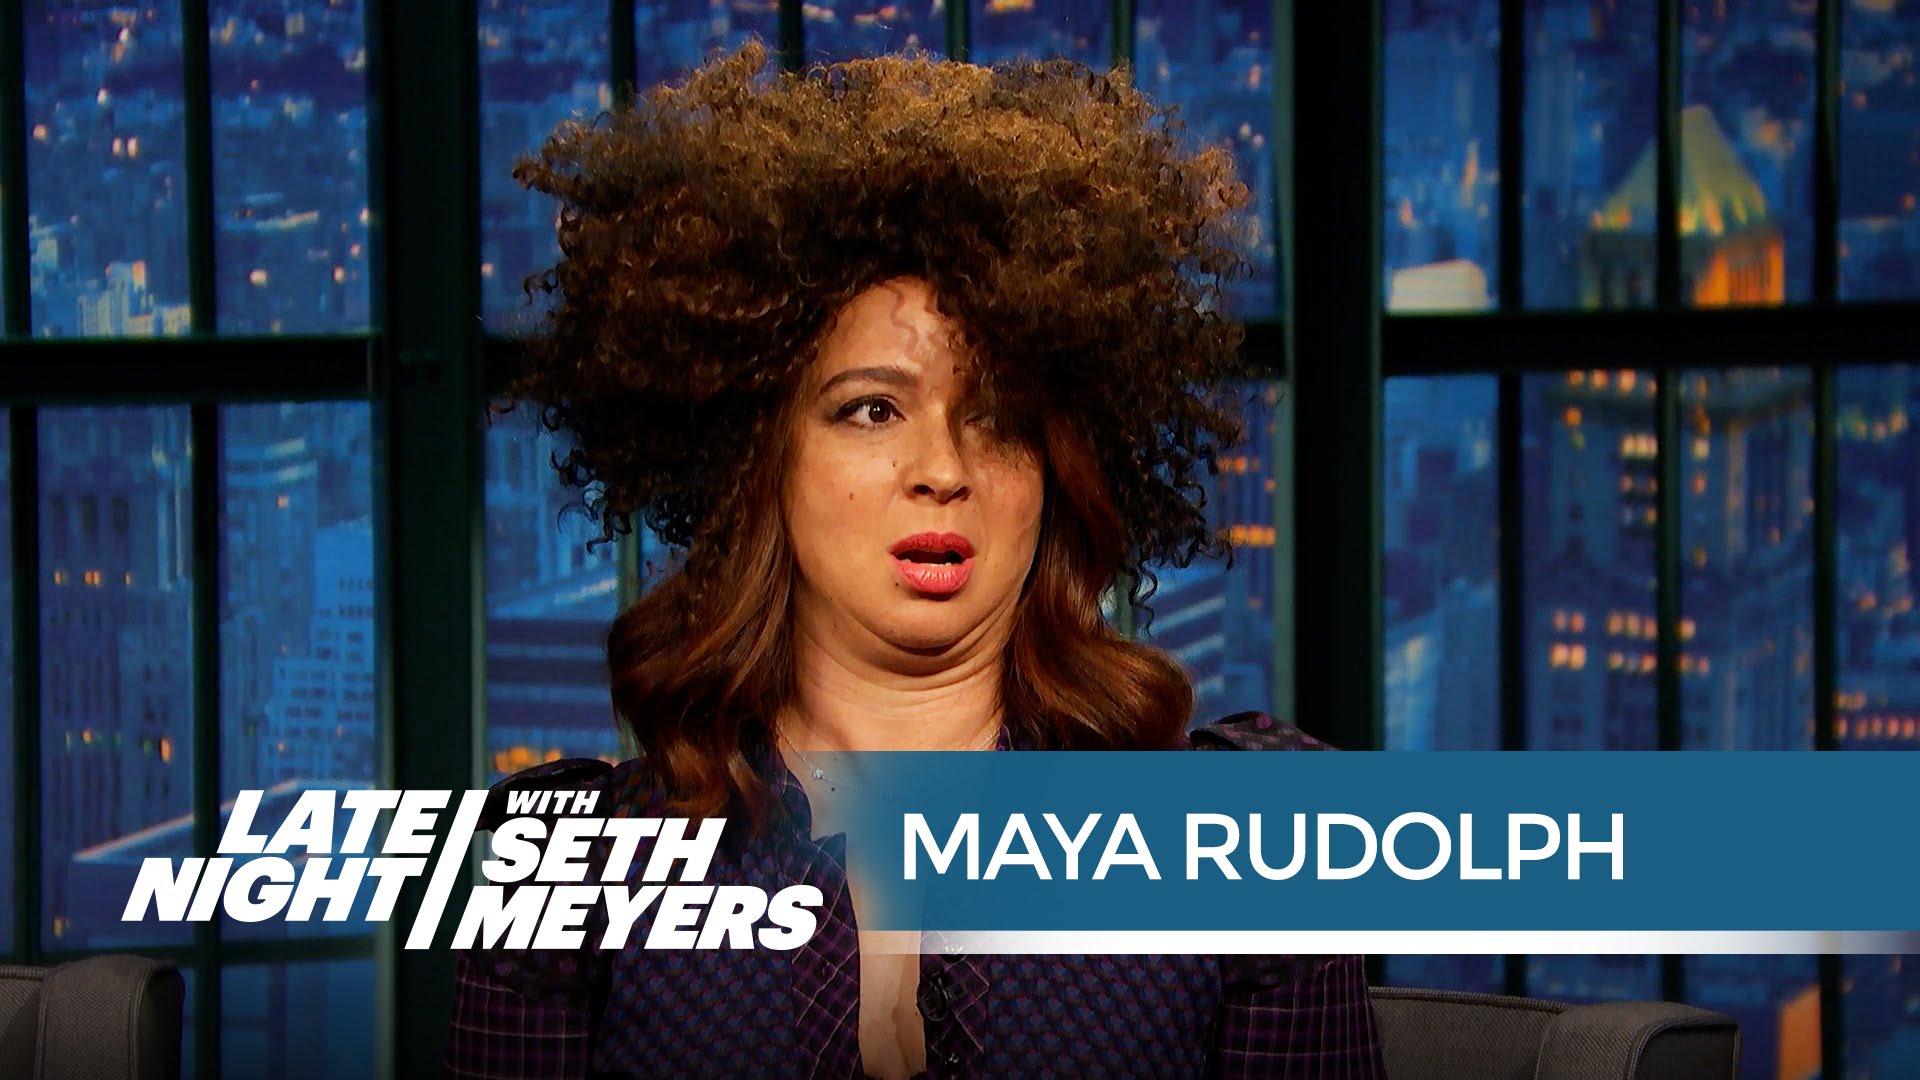 Maya Rudolph's Rachel Dolezal Impression – Late Night with Seth Meyers